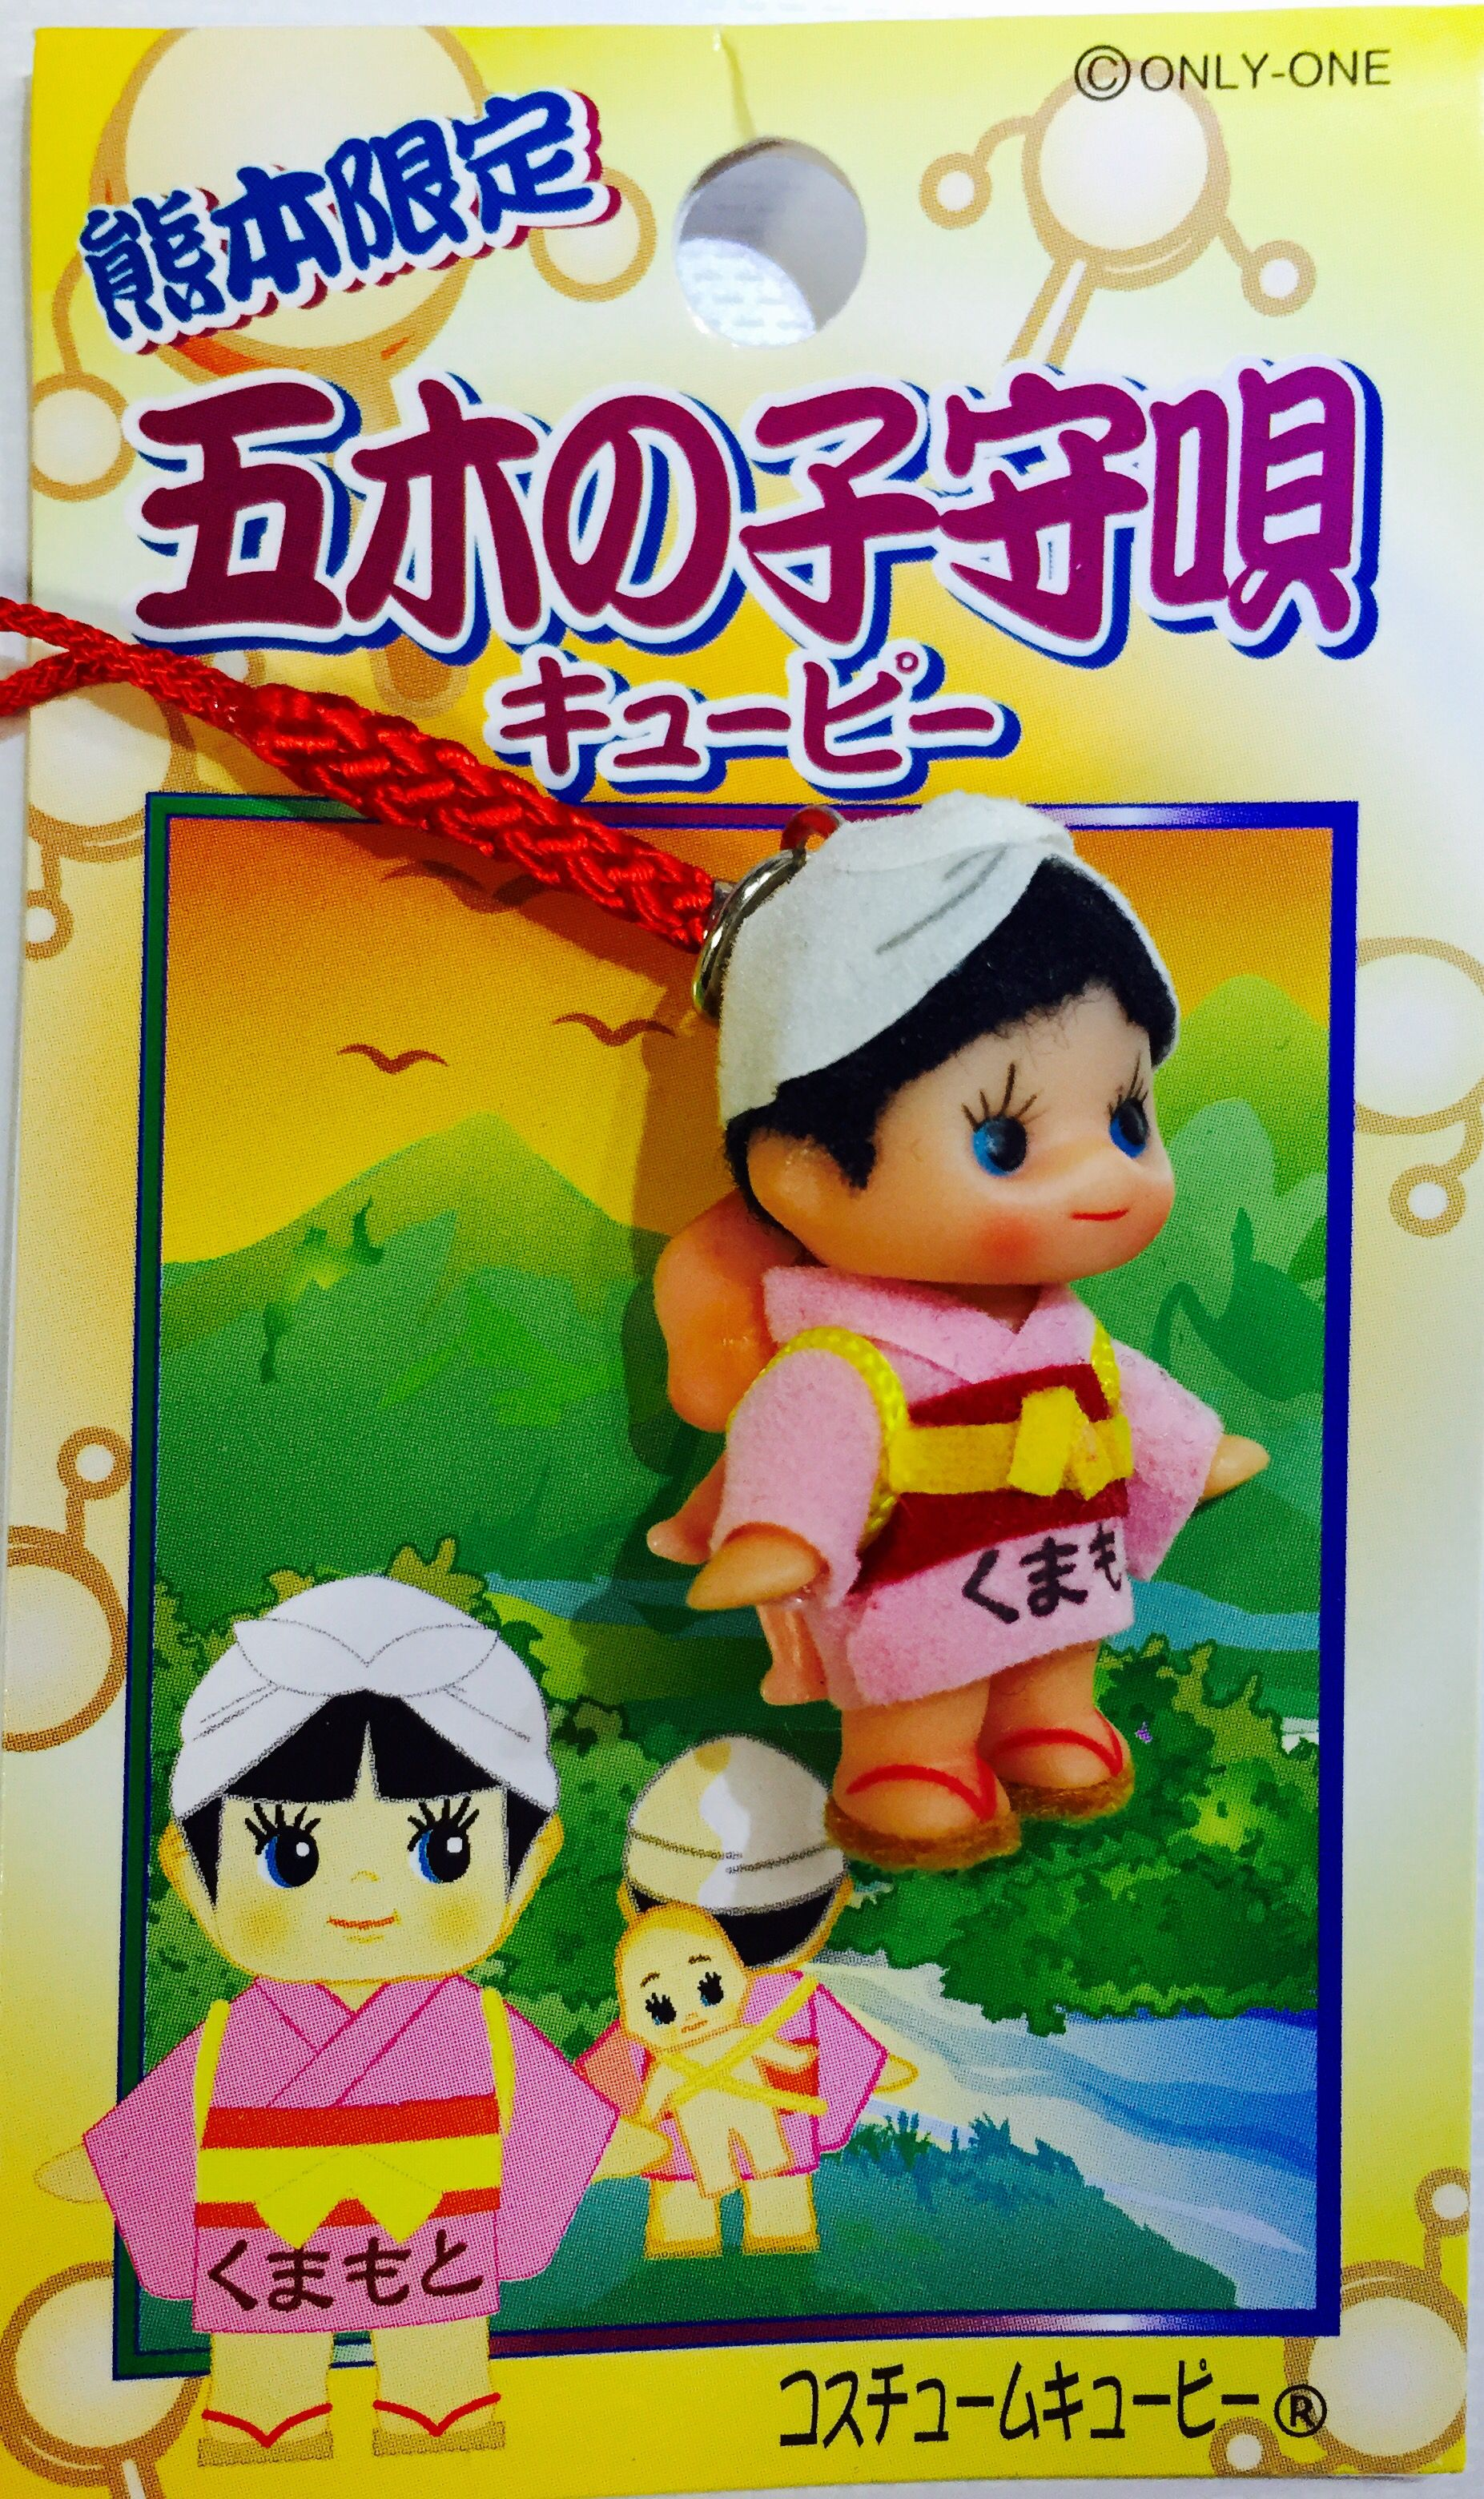 Kumamoto Regional Kewpie Itsuki Lullaby S Babysitter 熊本 ご当地キューピー 五木の子守歌キューピー Kewpie Frosted Flakes Cereal Box Cereal